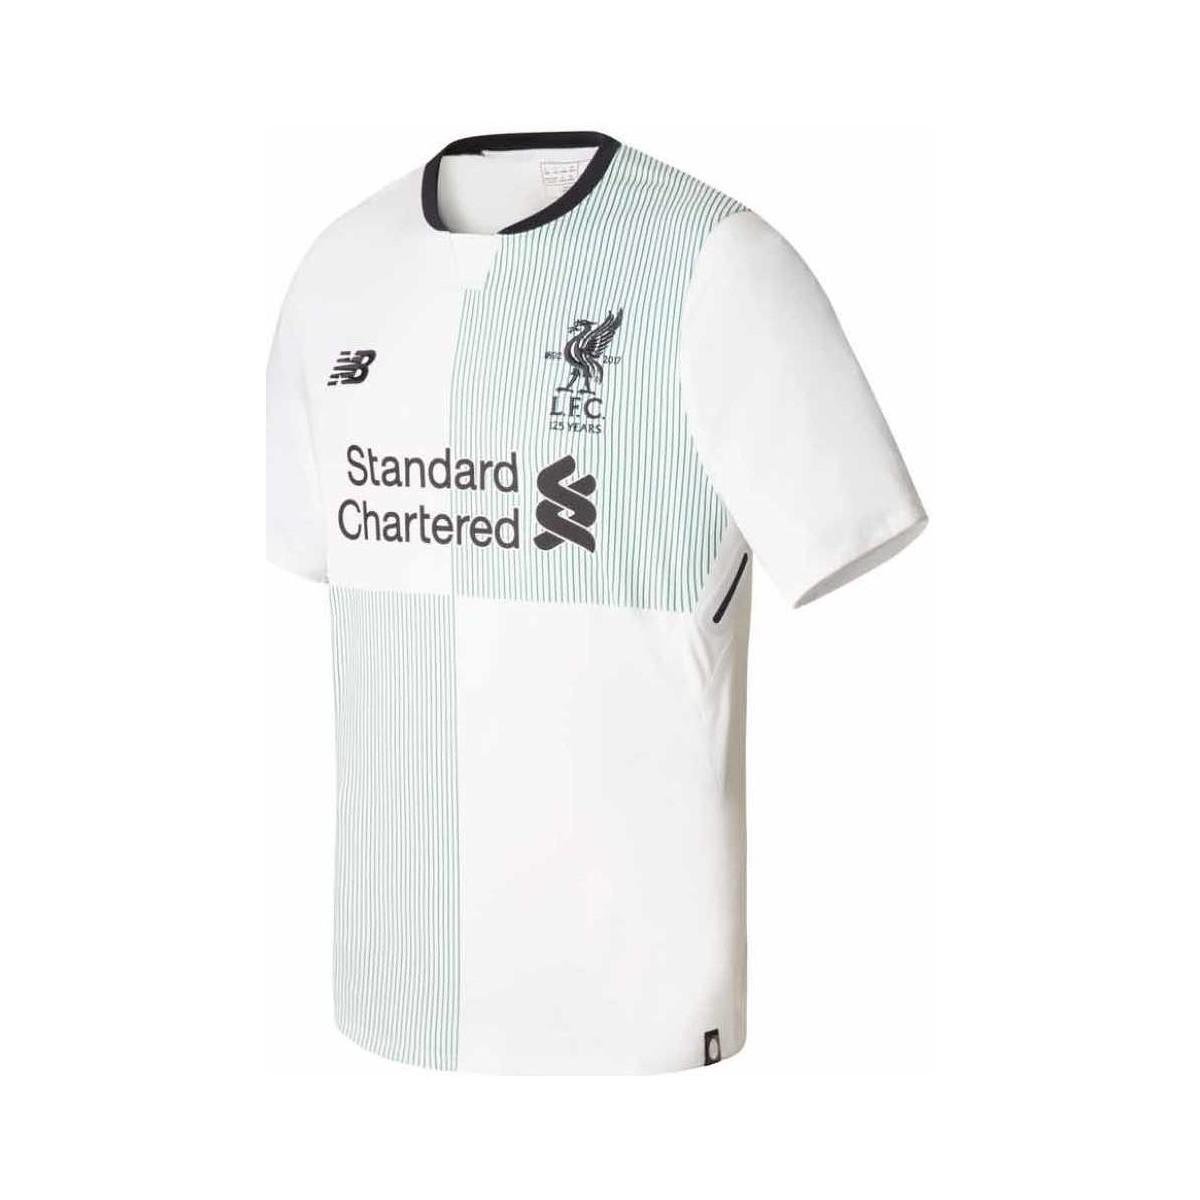 45fe09a50 New Balance 2017-18 Liverpool Away Shirt (dalglish 7) Men s T Shirt ...